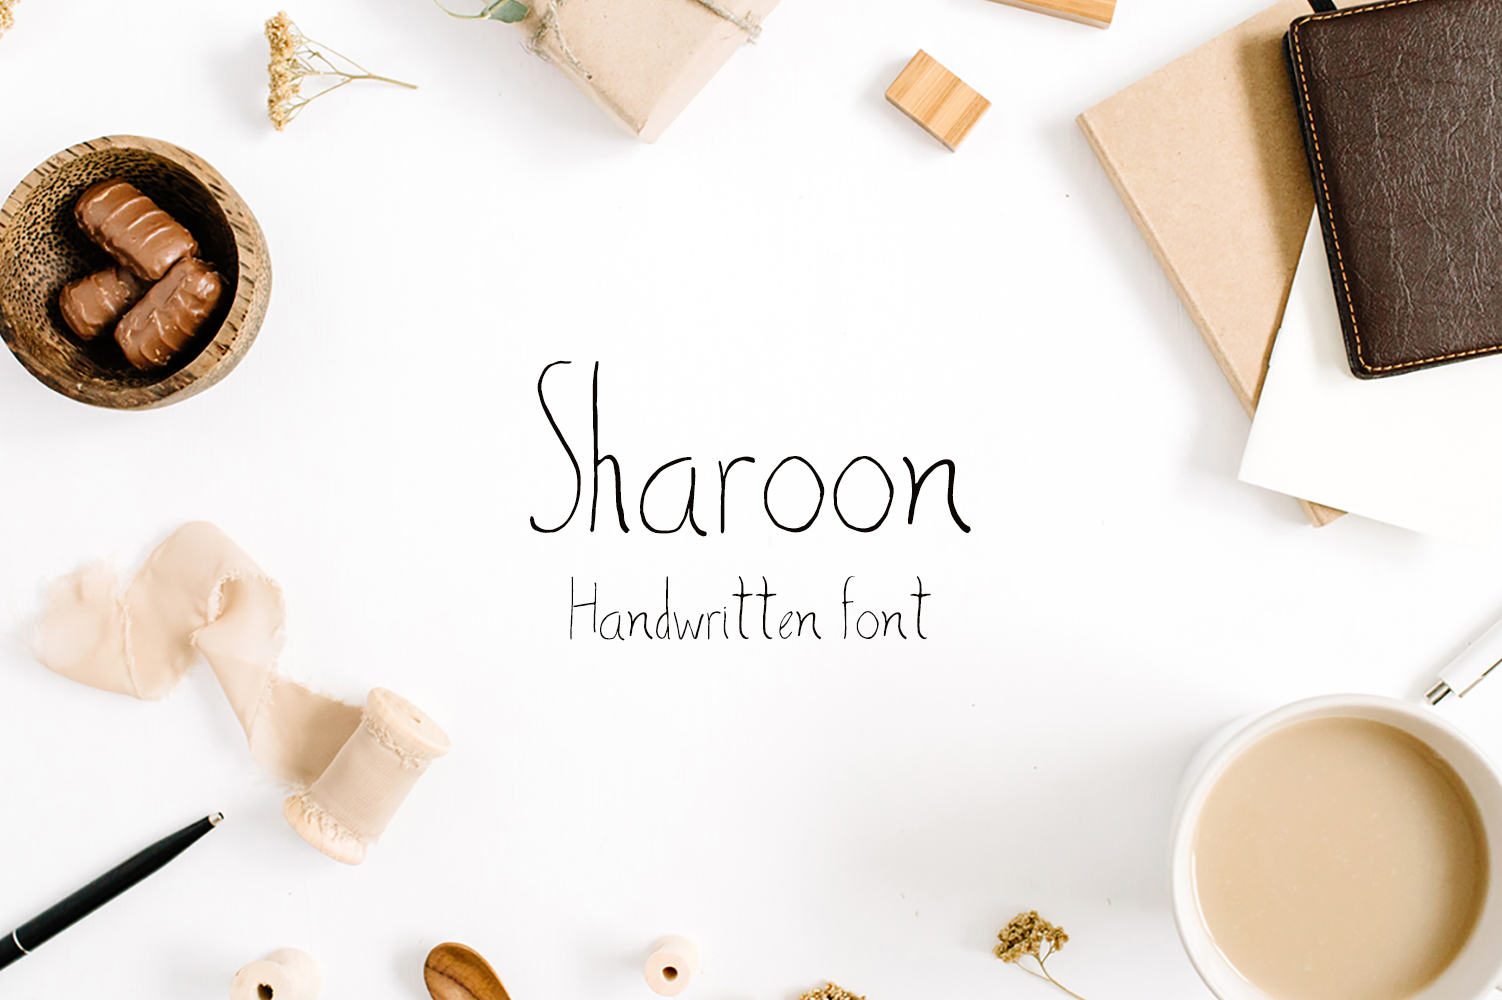 Sharoon Handwritten Sans Serif Font example image 1